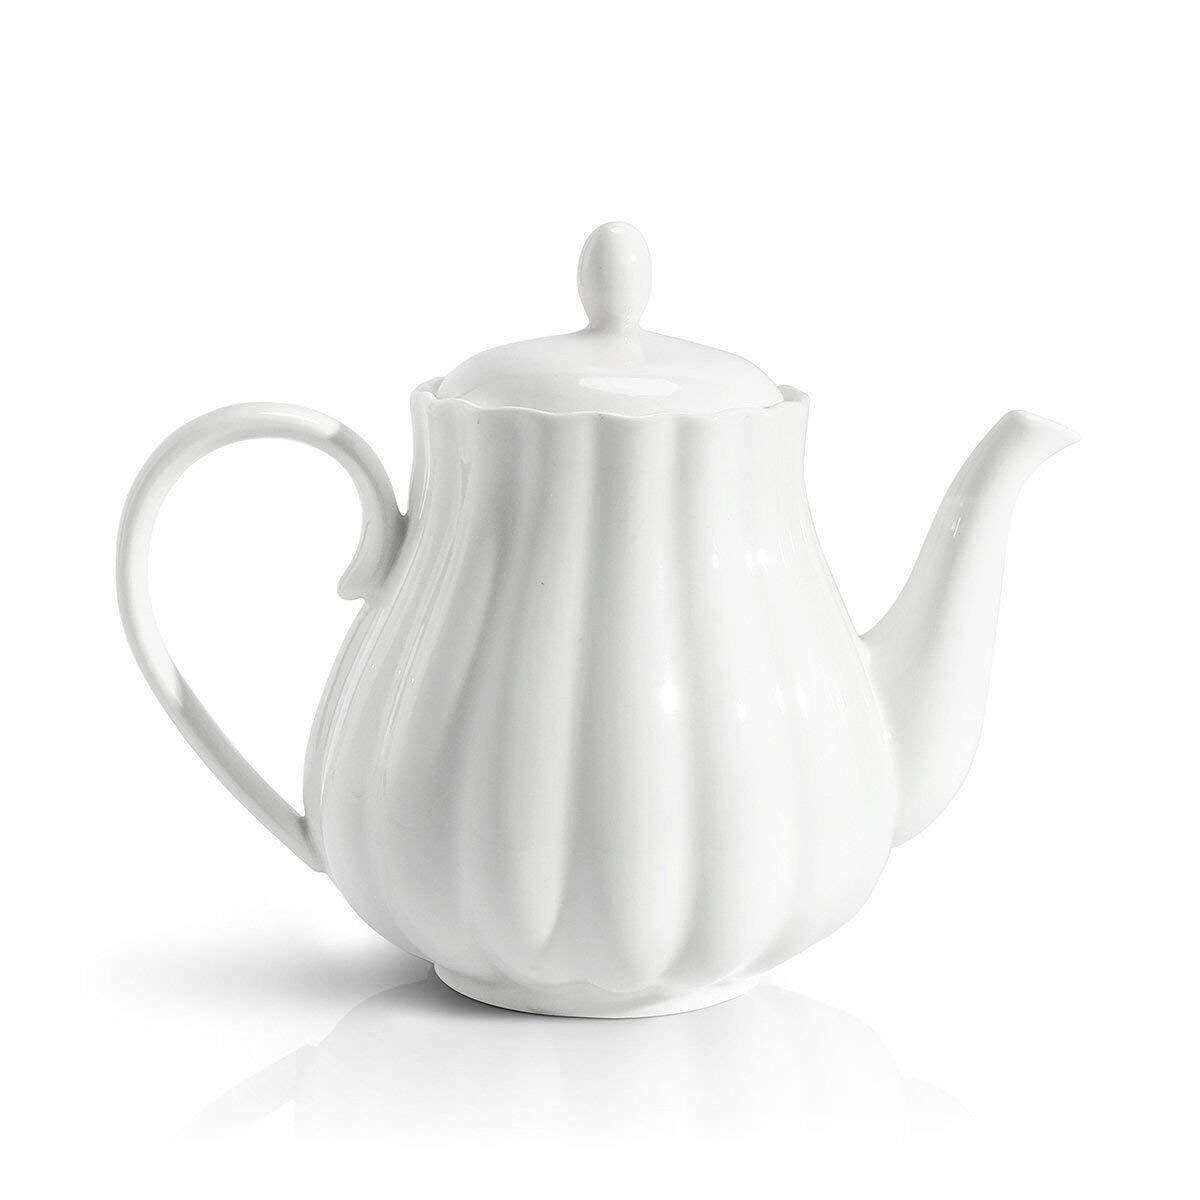 Sweese 2301 Teapot Pumpkin Fluted Shape, White - 28 Ounce